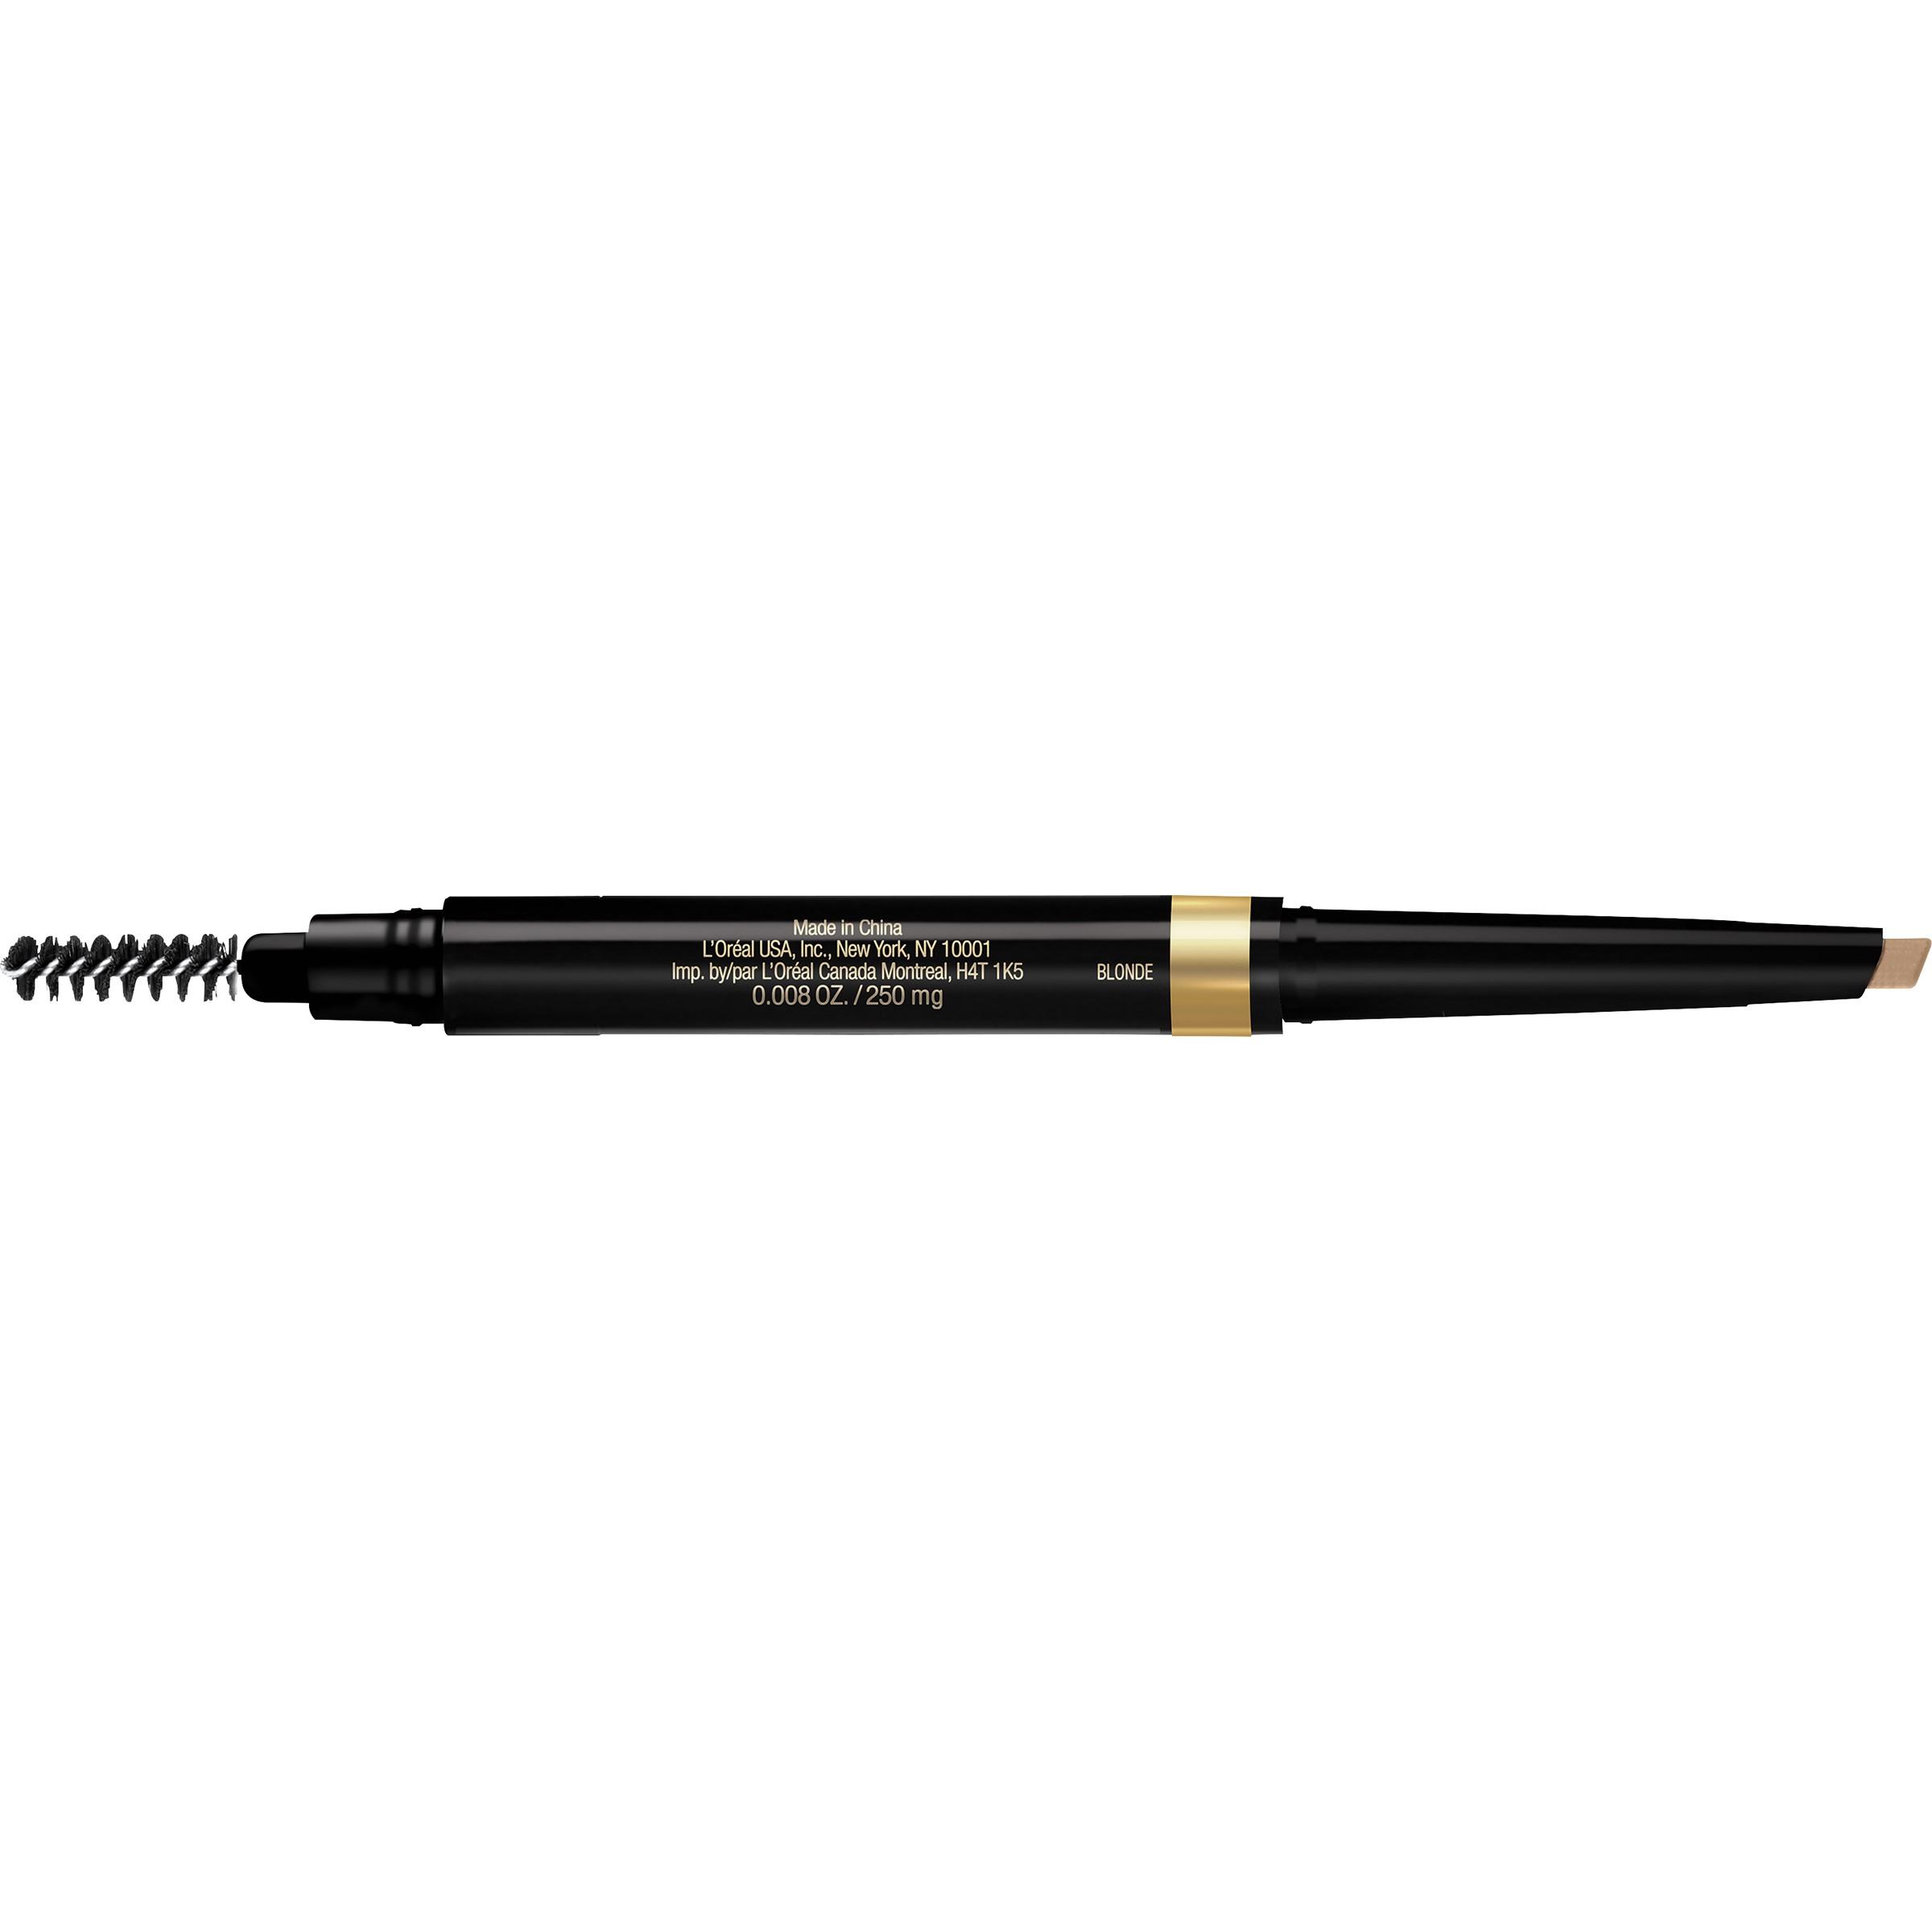 L'Oreal Paris Brow Stylist Shape and Fill Pencil, Blonde, 0.008 Oz